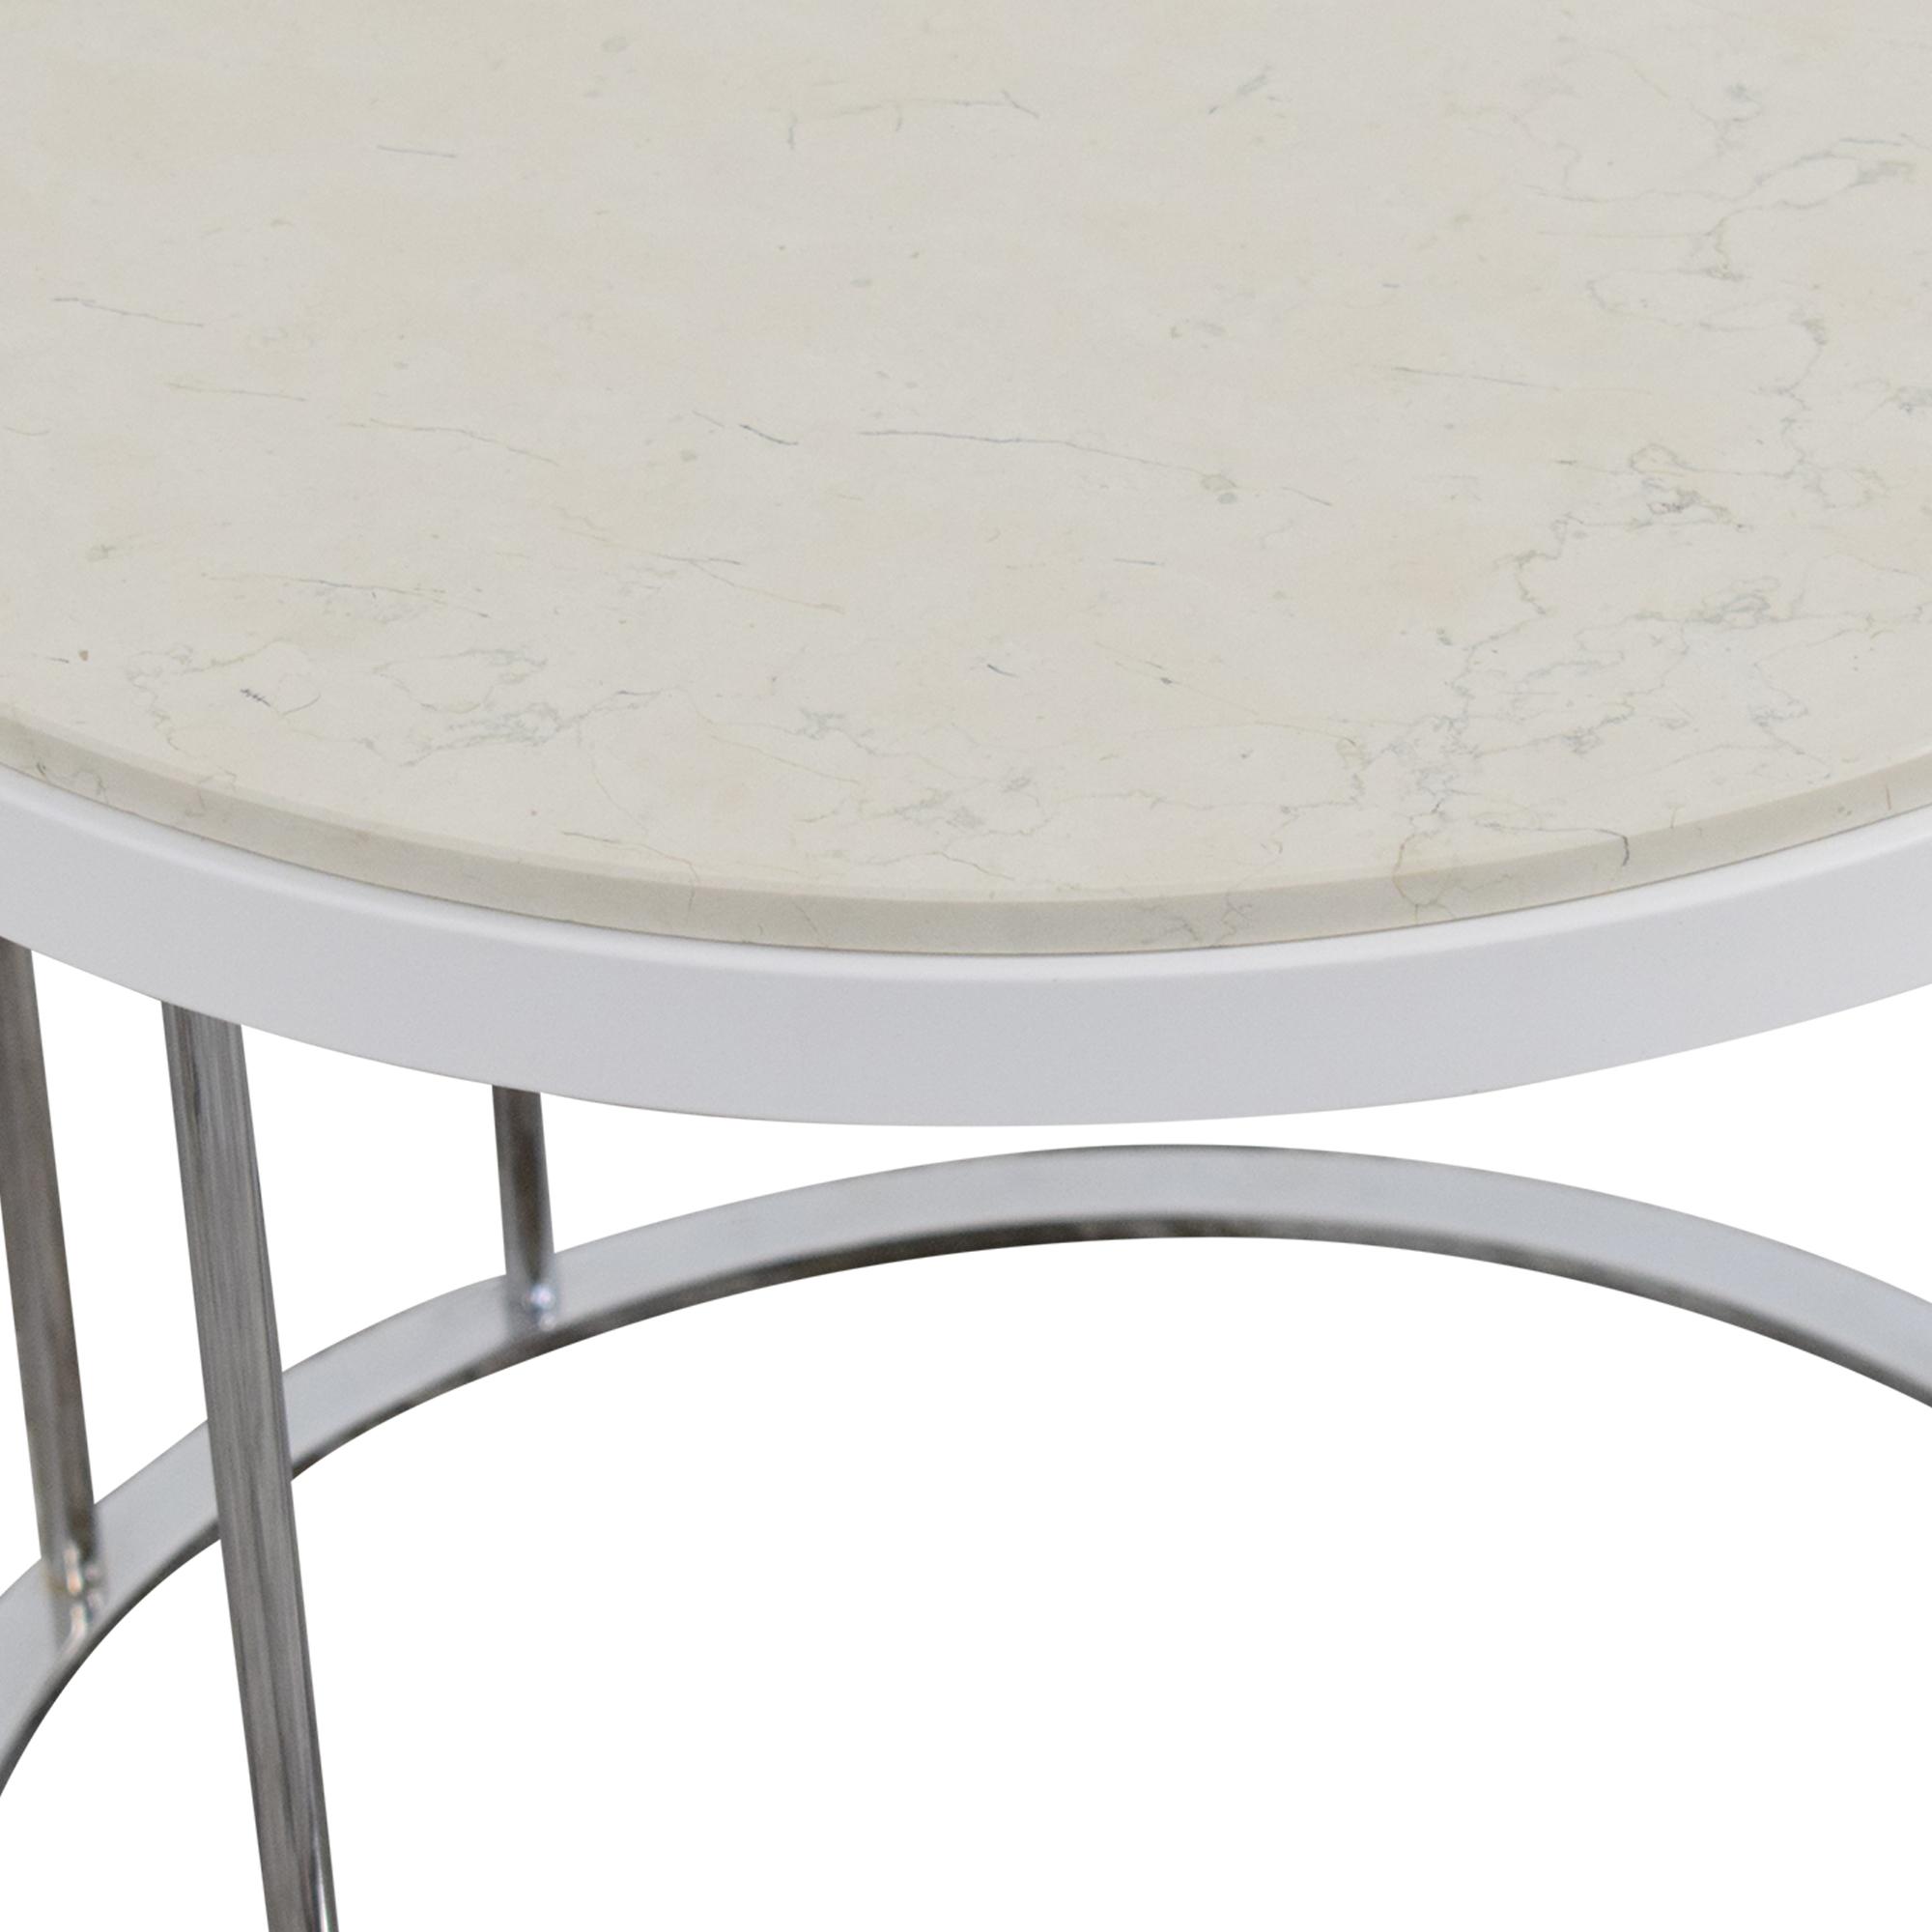 Koleksiyon Koleksiyon Perrino End Table used